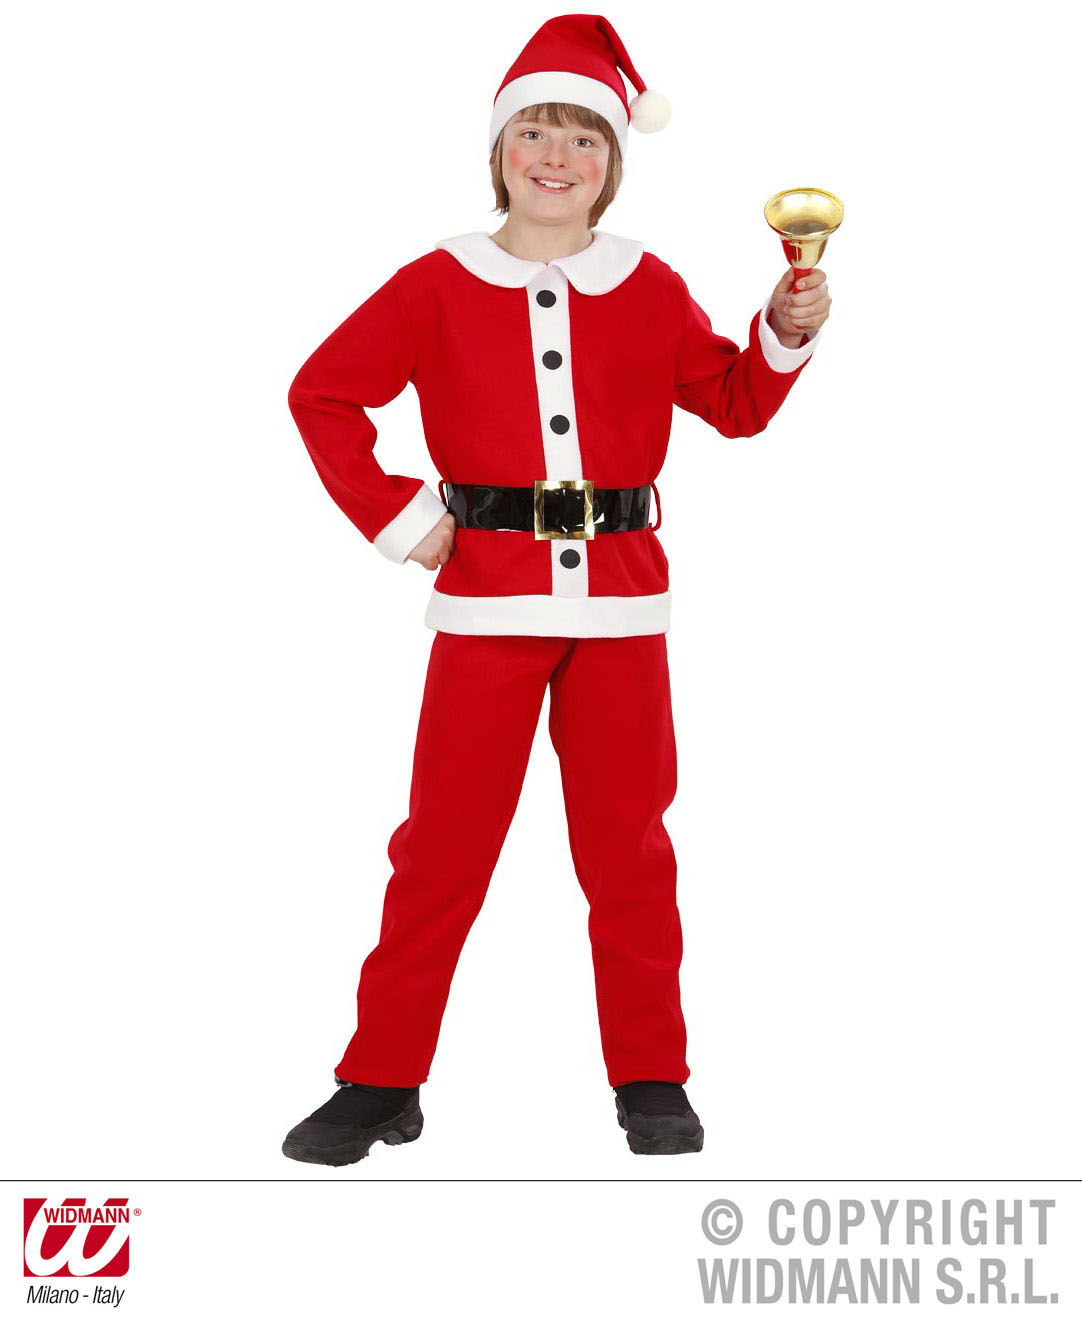 4 tlg Weihnachtskostüm, Anzug komplett Kinder Gr. 116, 128